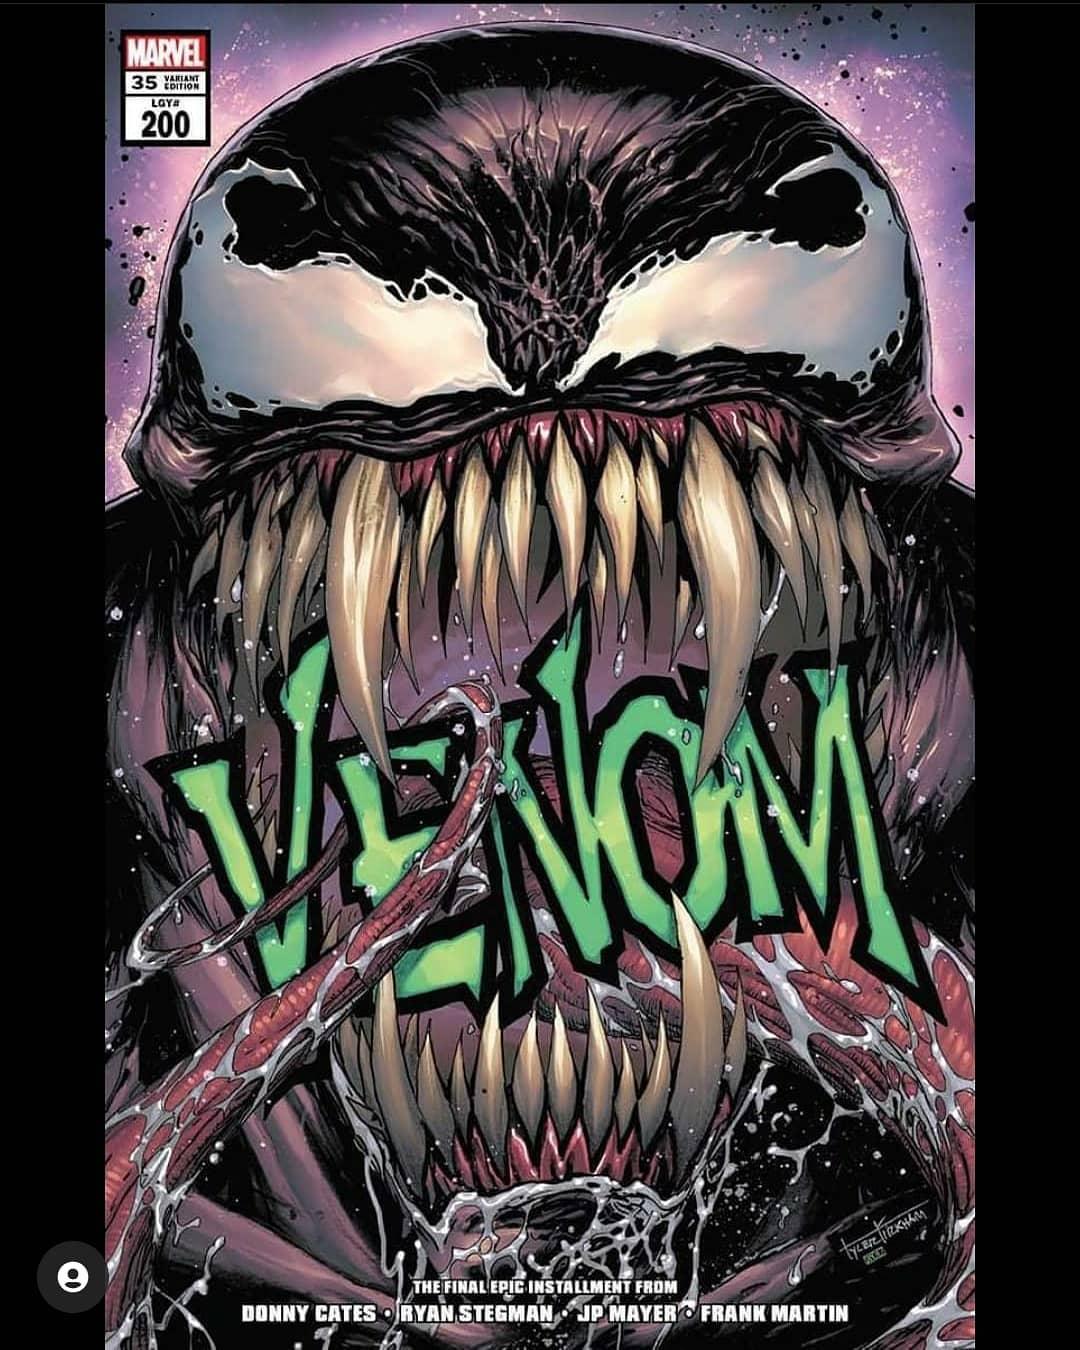 Venom #200 & #35